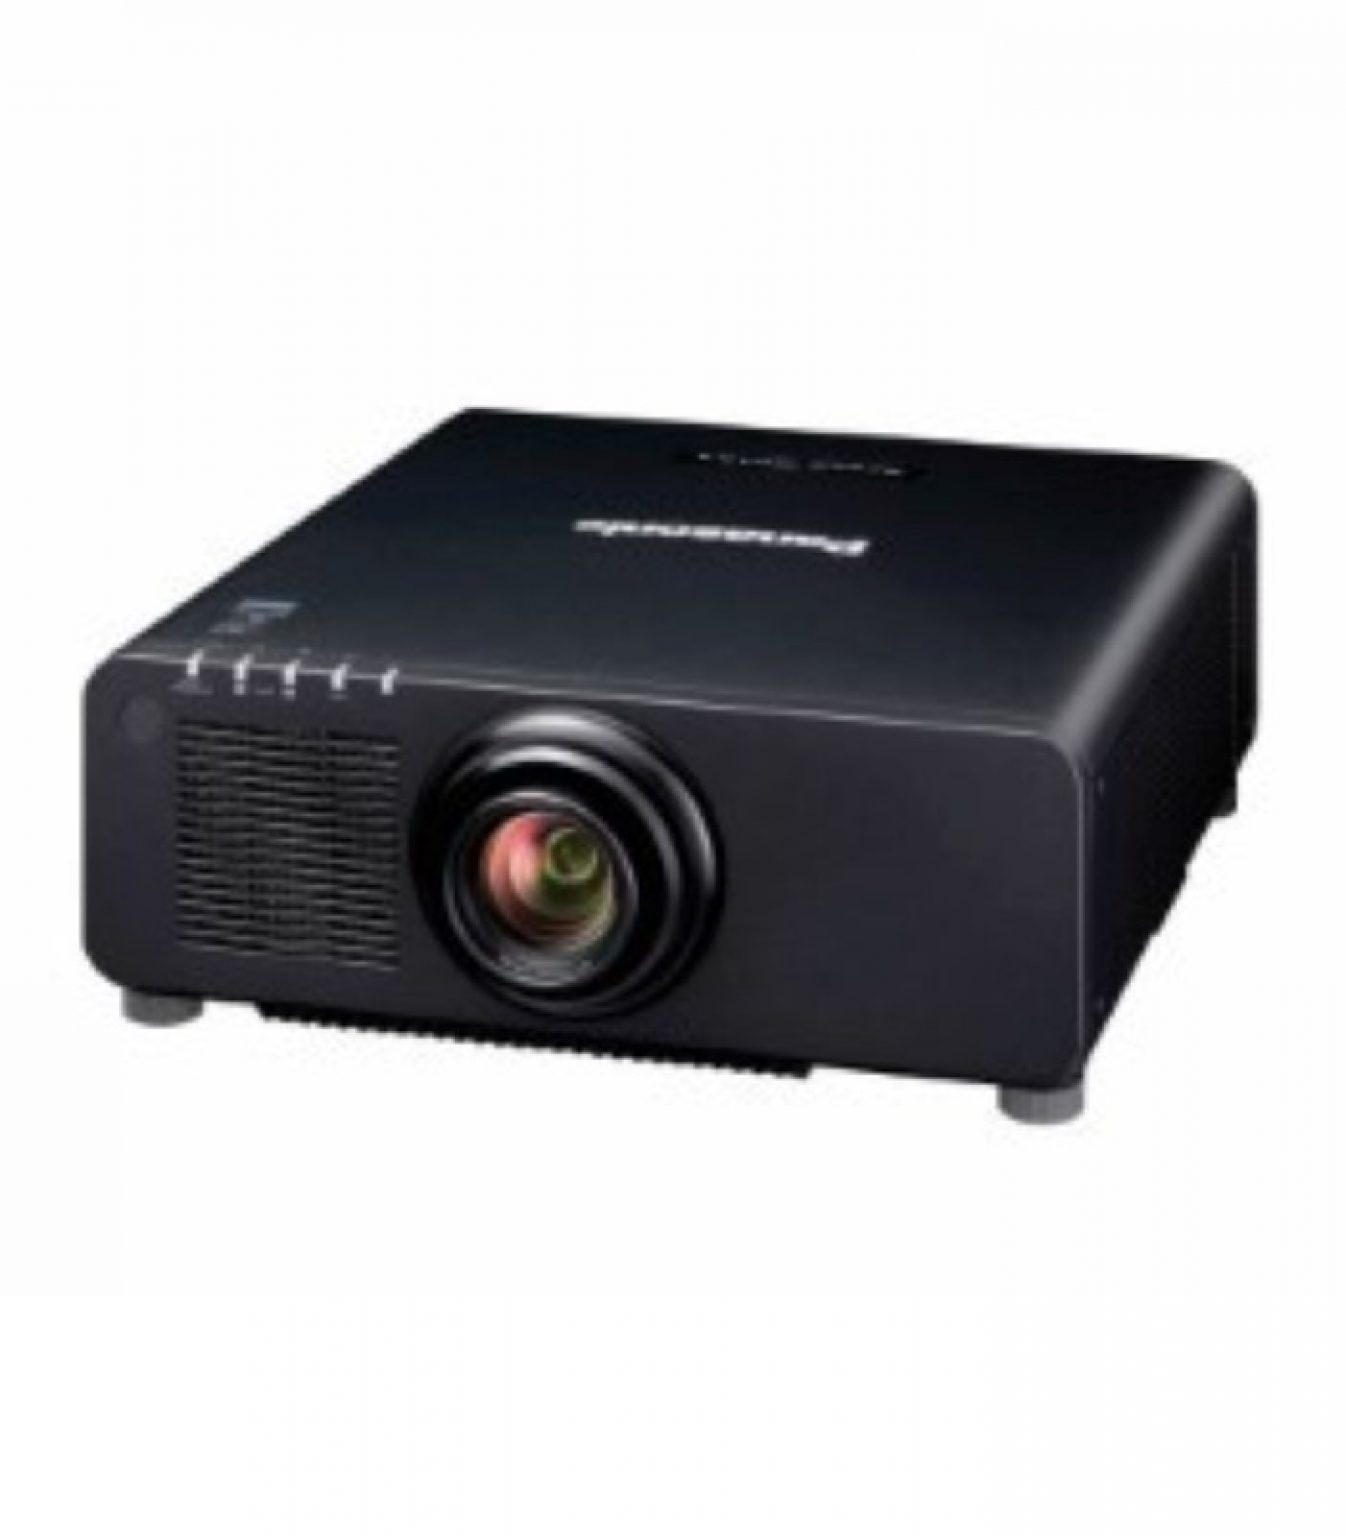 PANASONIC - Projector PT-RX110